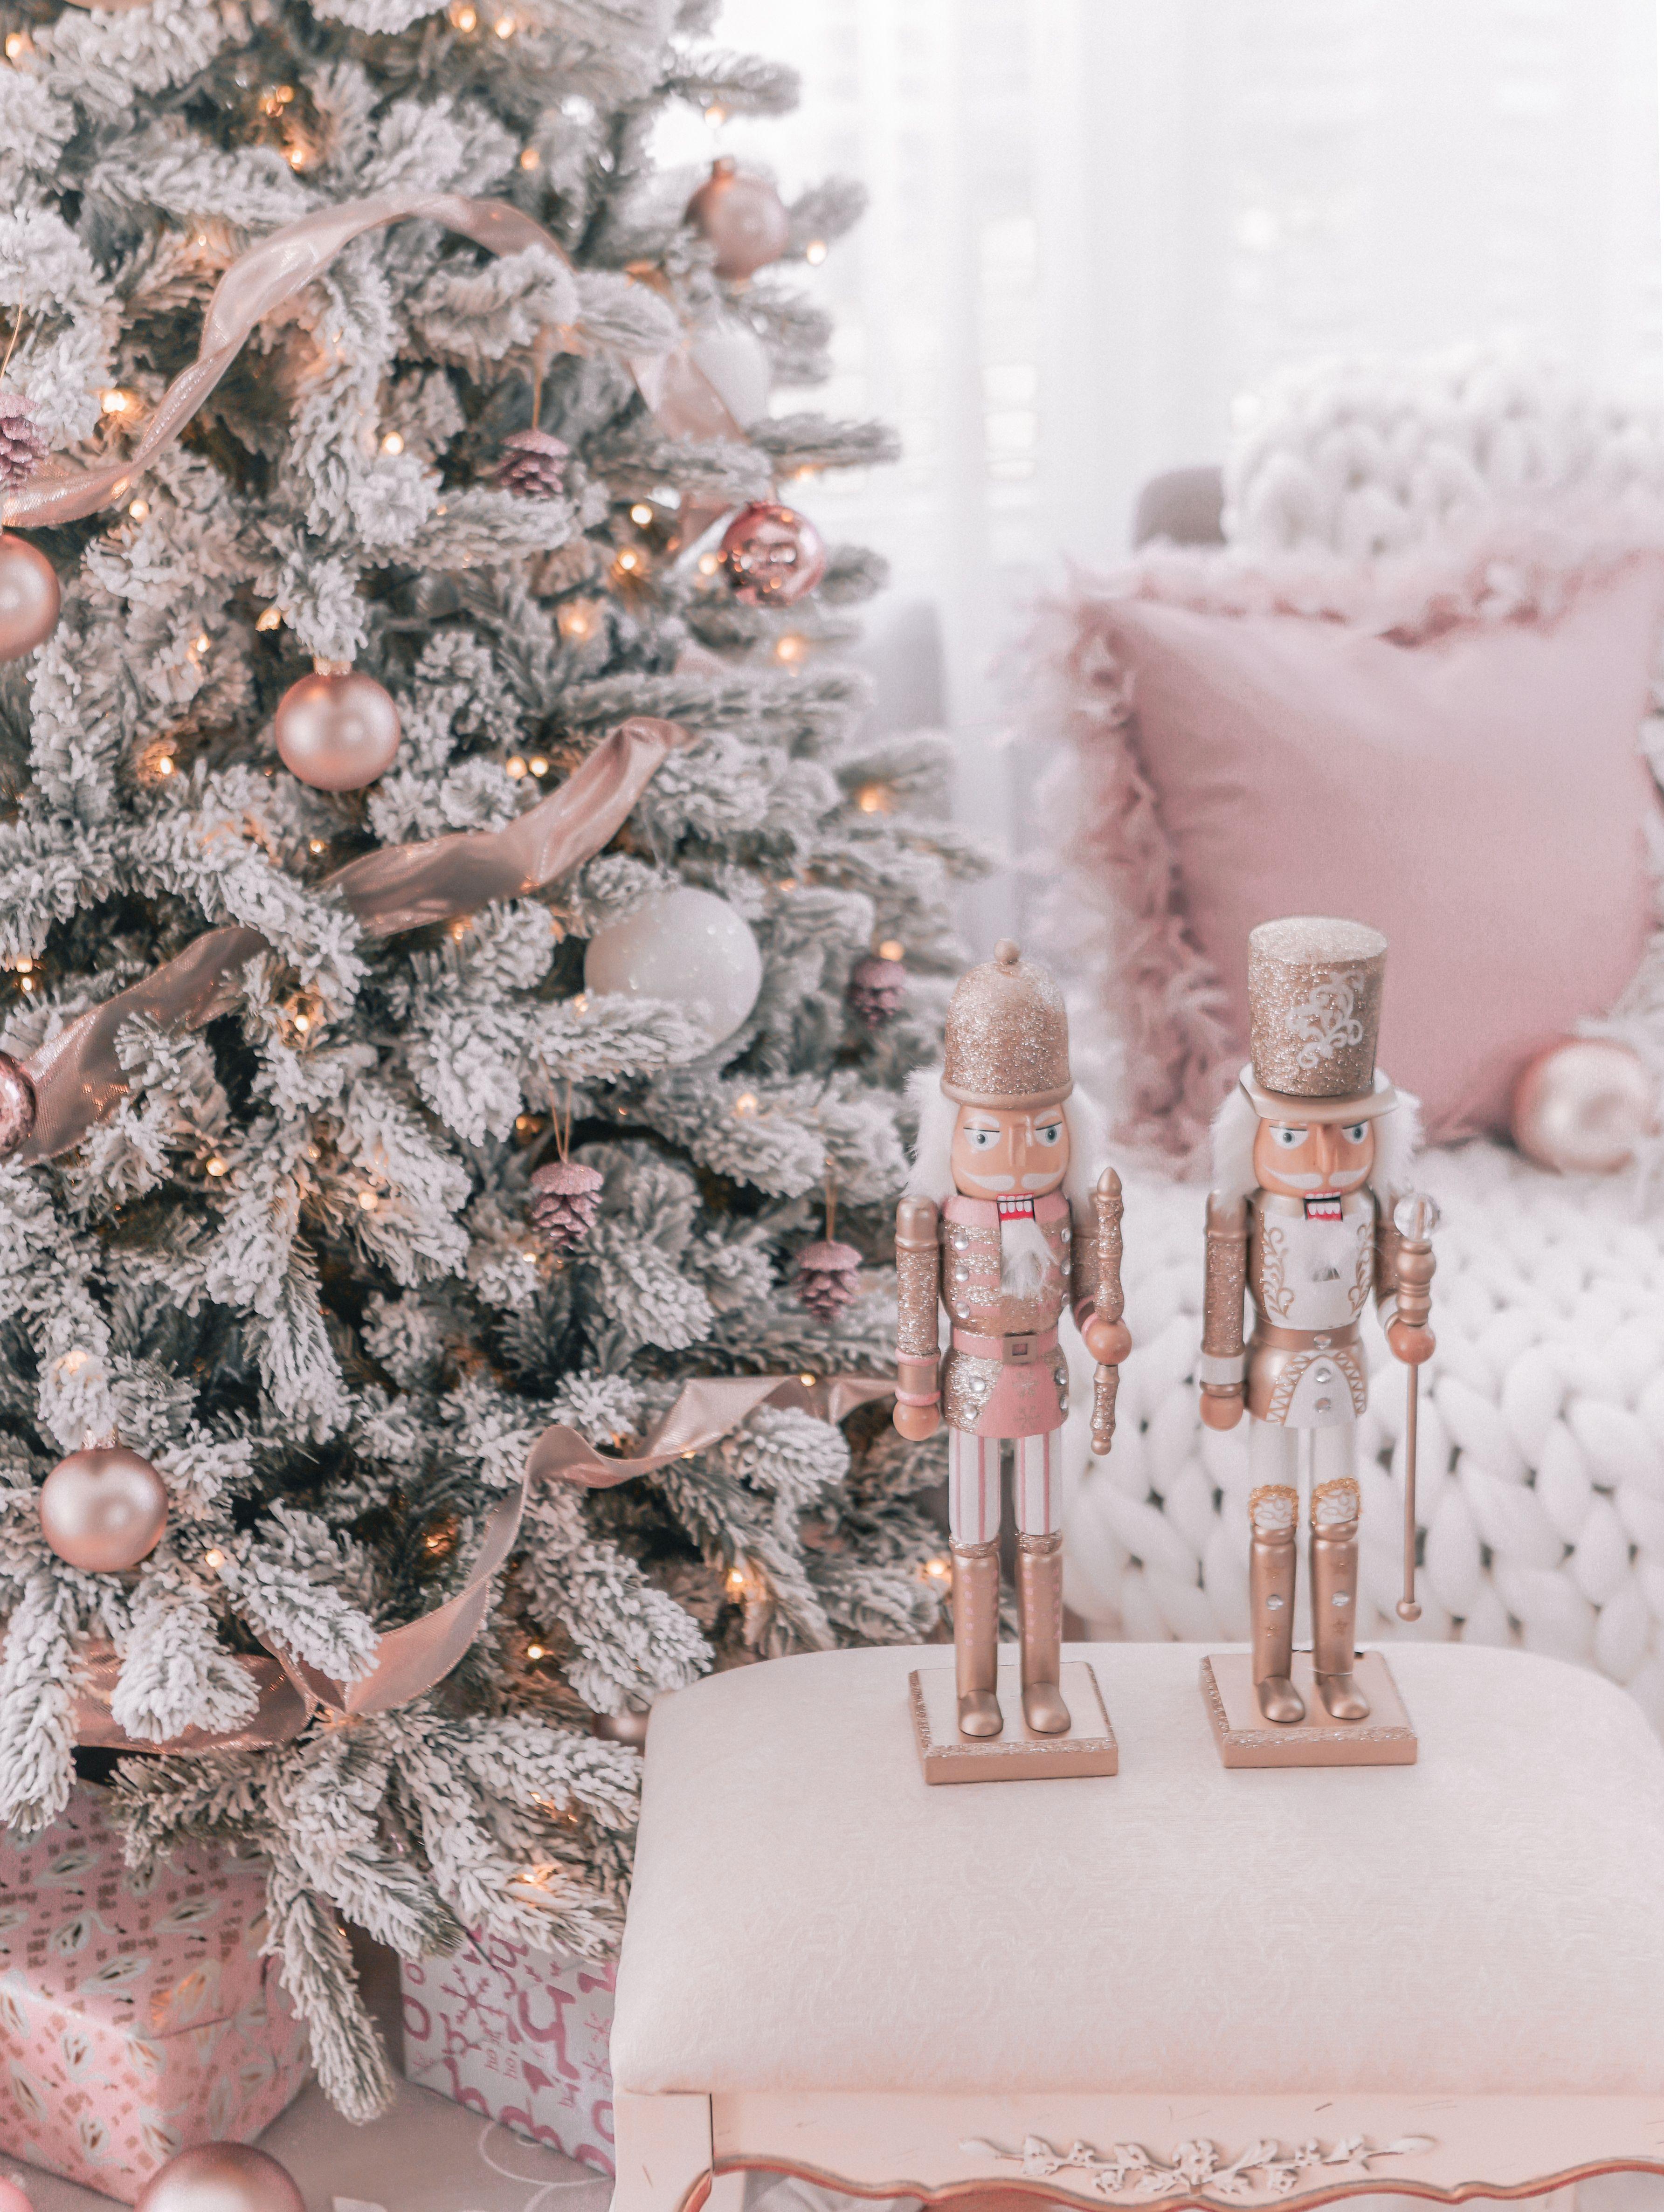 Н™³ðšŽðšŸðš'𝚗𝚒𝚝𝚢𝚢 Gold Christmas Decorations Rose Gold Christmas Pink Christmas Tree Decorations